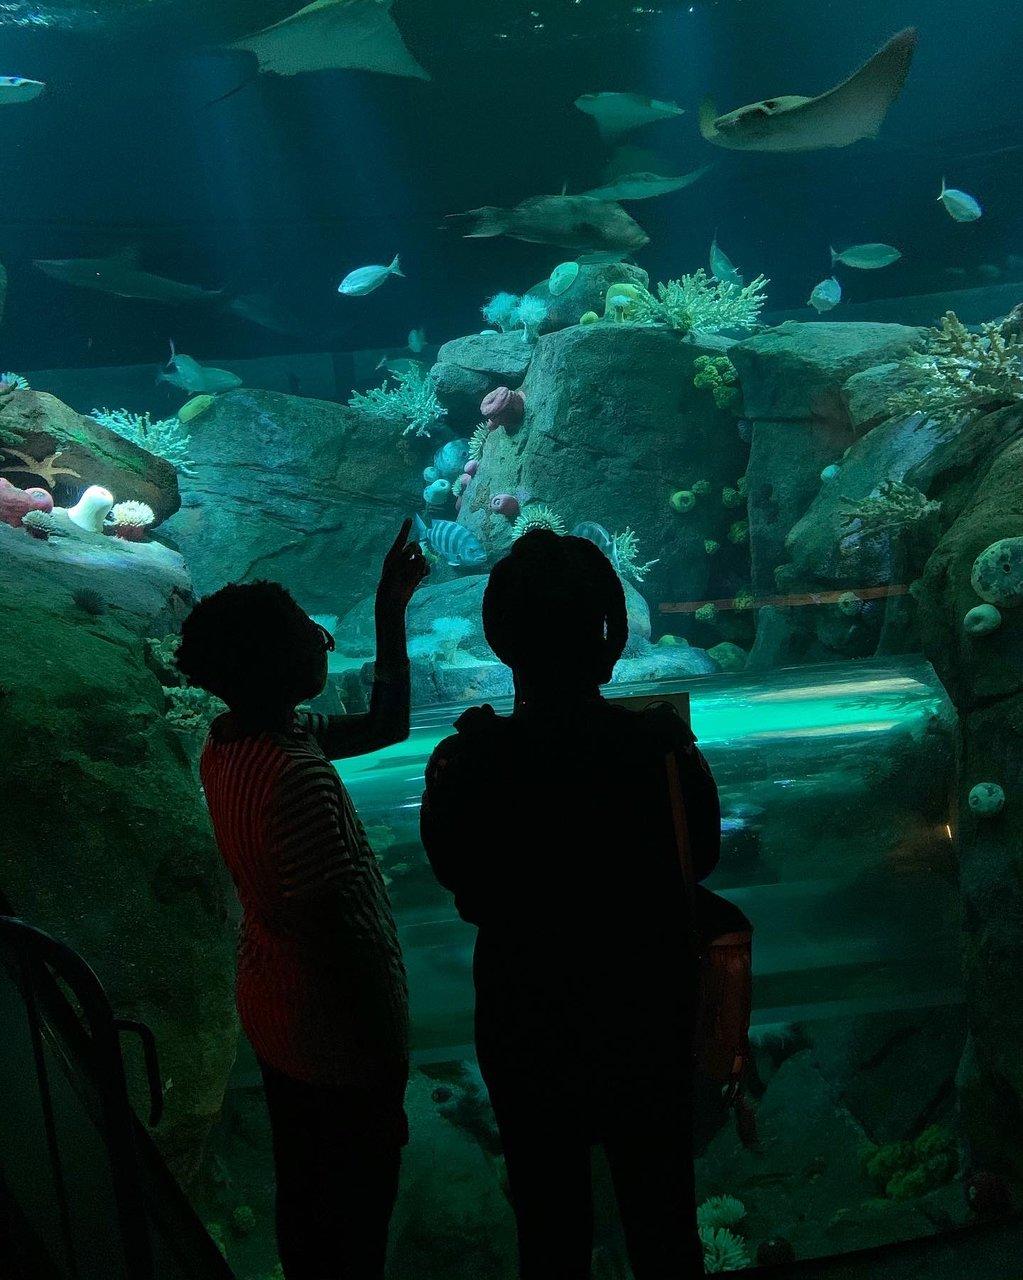 New York Aquarium Brooklyn 2020 All